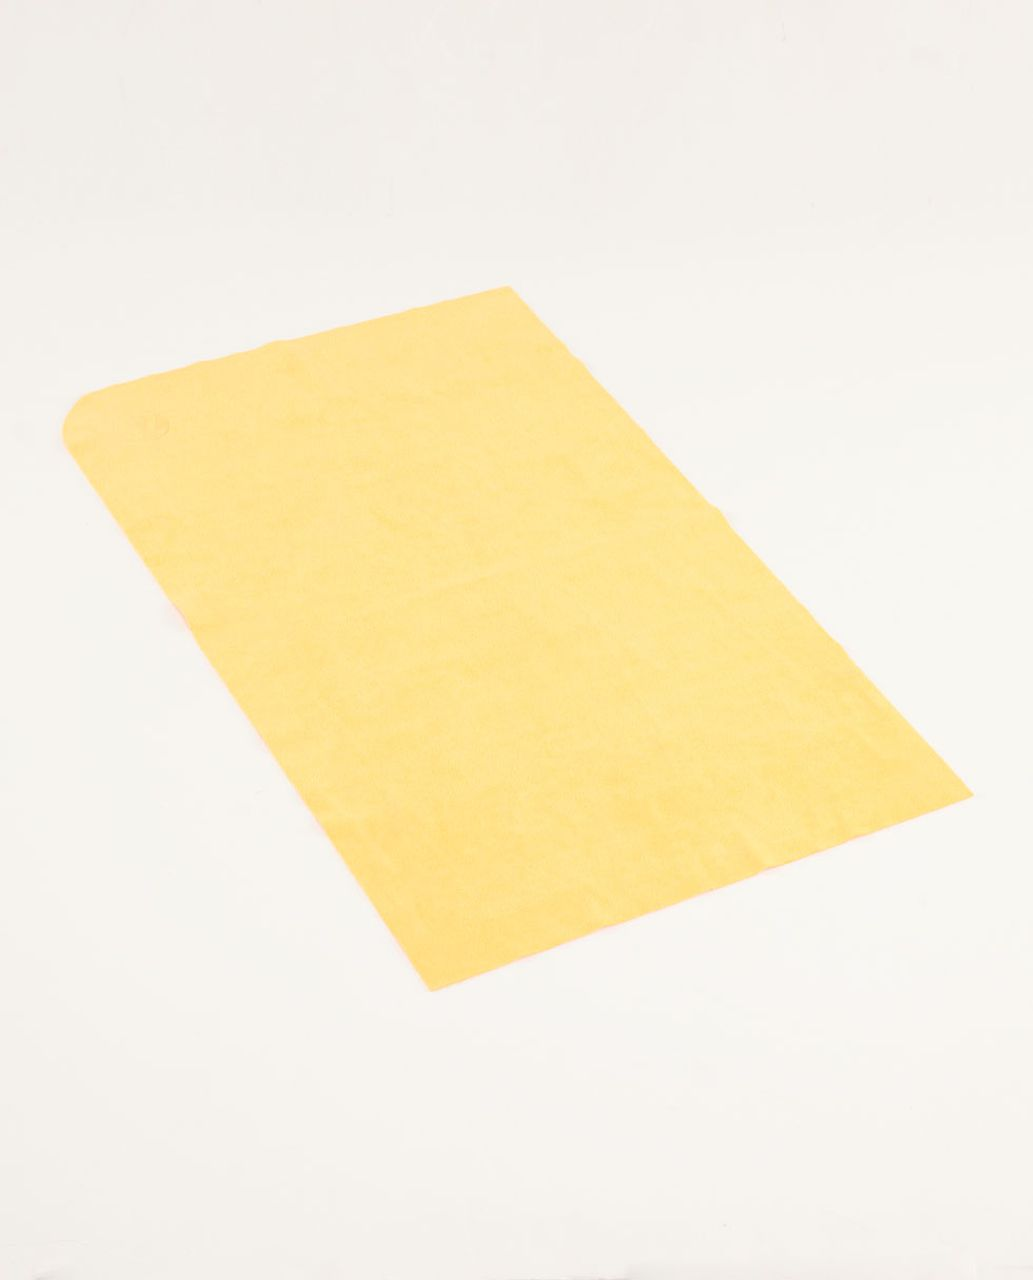 Lululemon The (Small) Towel - Creamsicle Pop